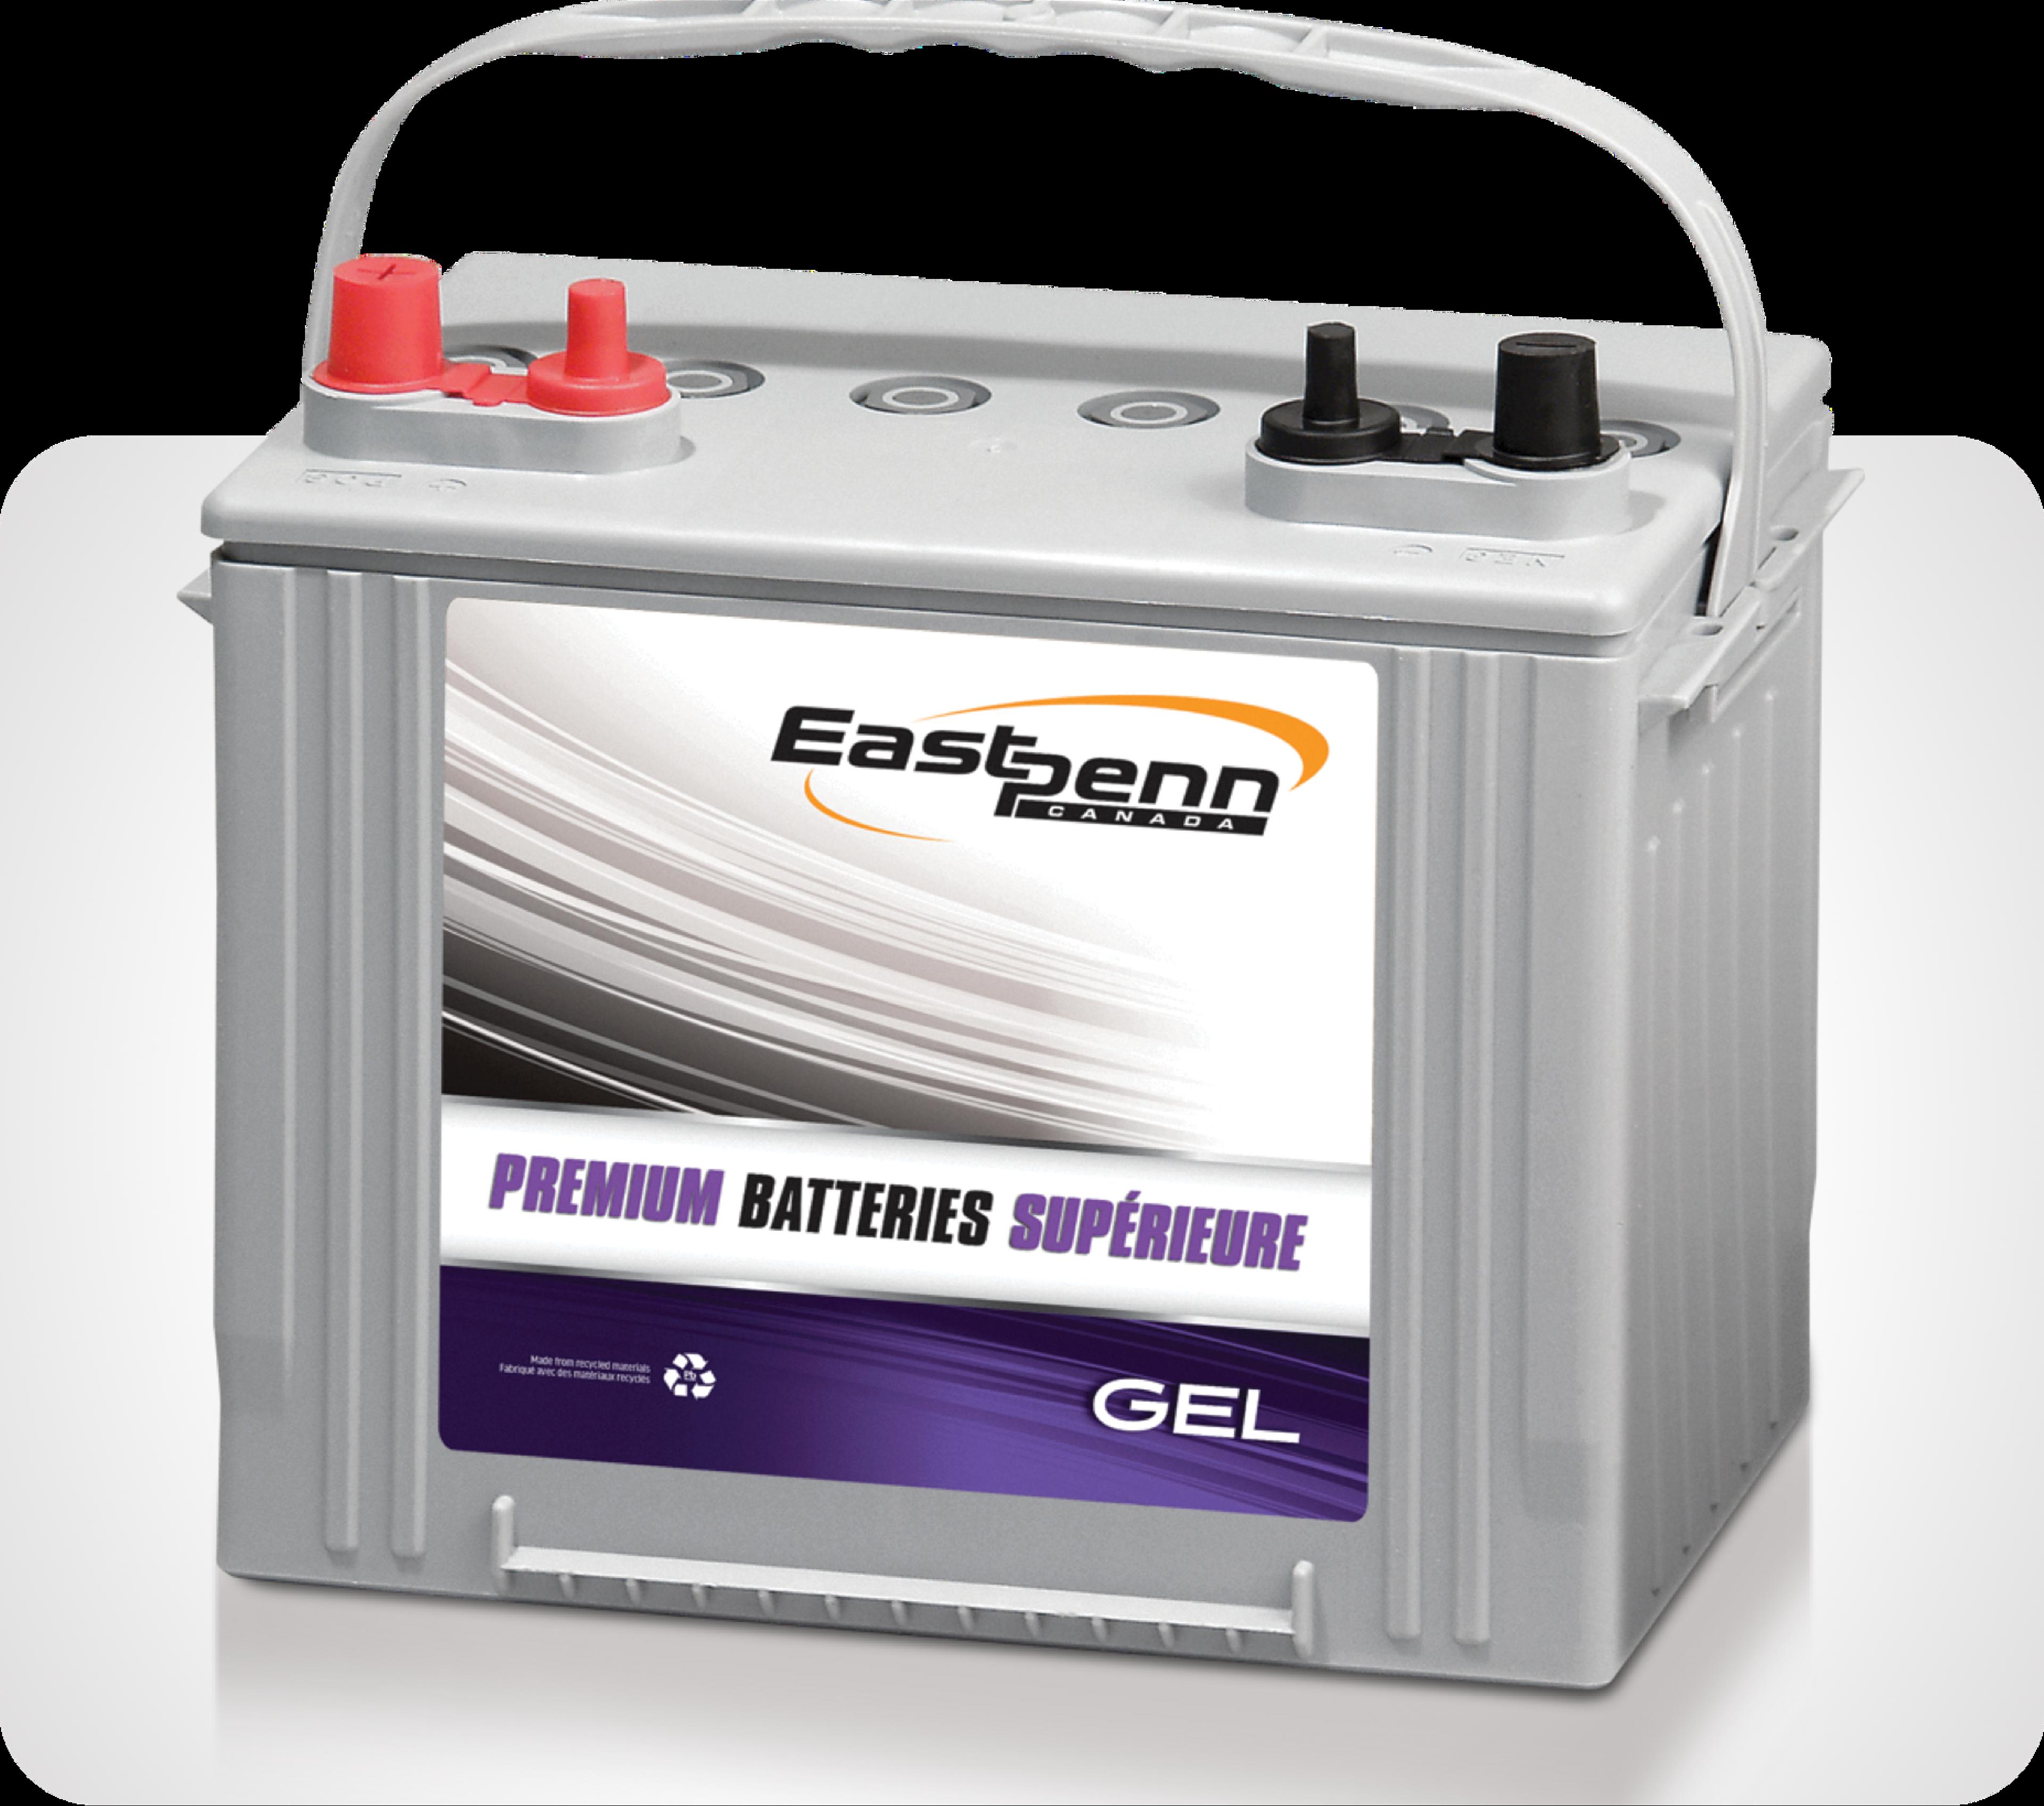 Picture of East Penn brand Premium Gel battery